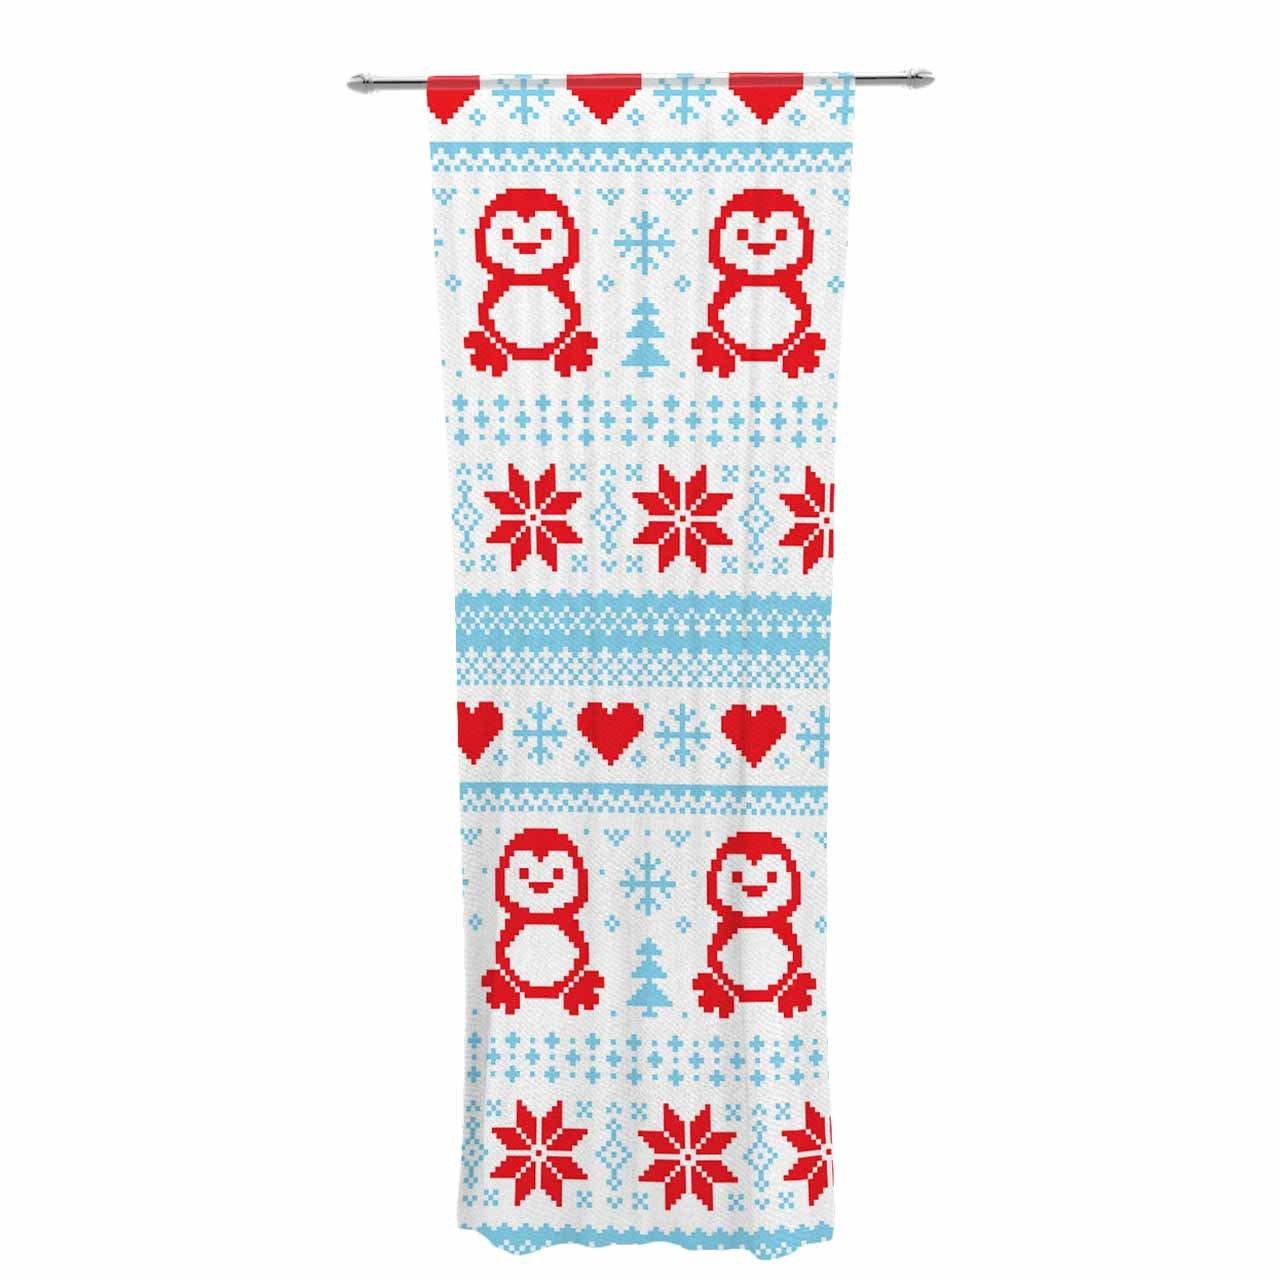 Kess InHouse Kess Original Pixel Penguin Holiday Sheer Curtains 30 x 84